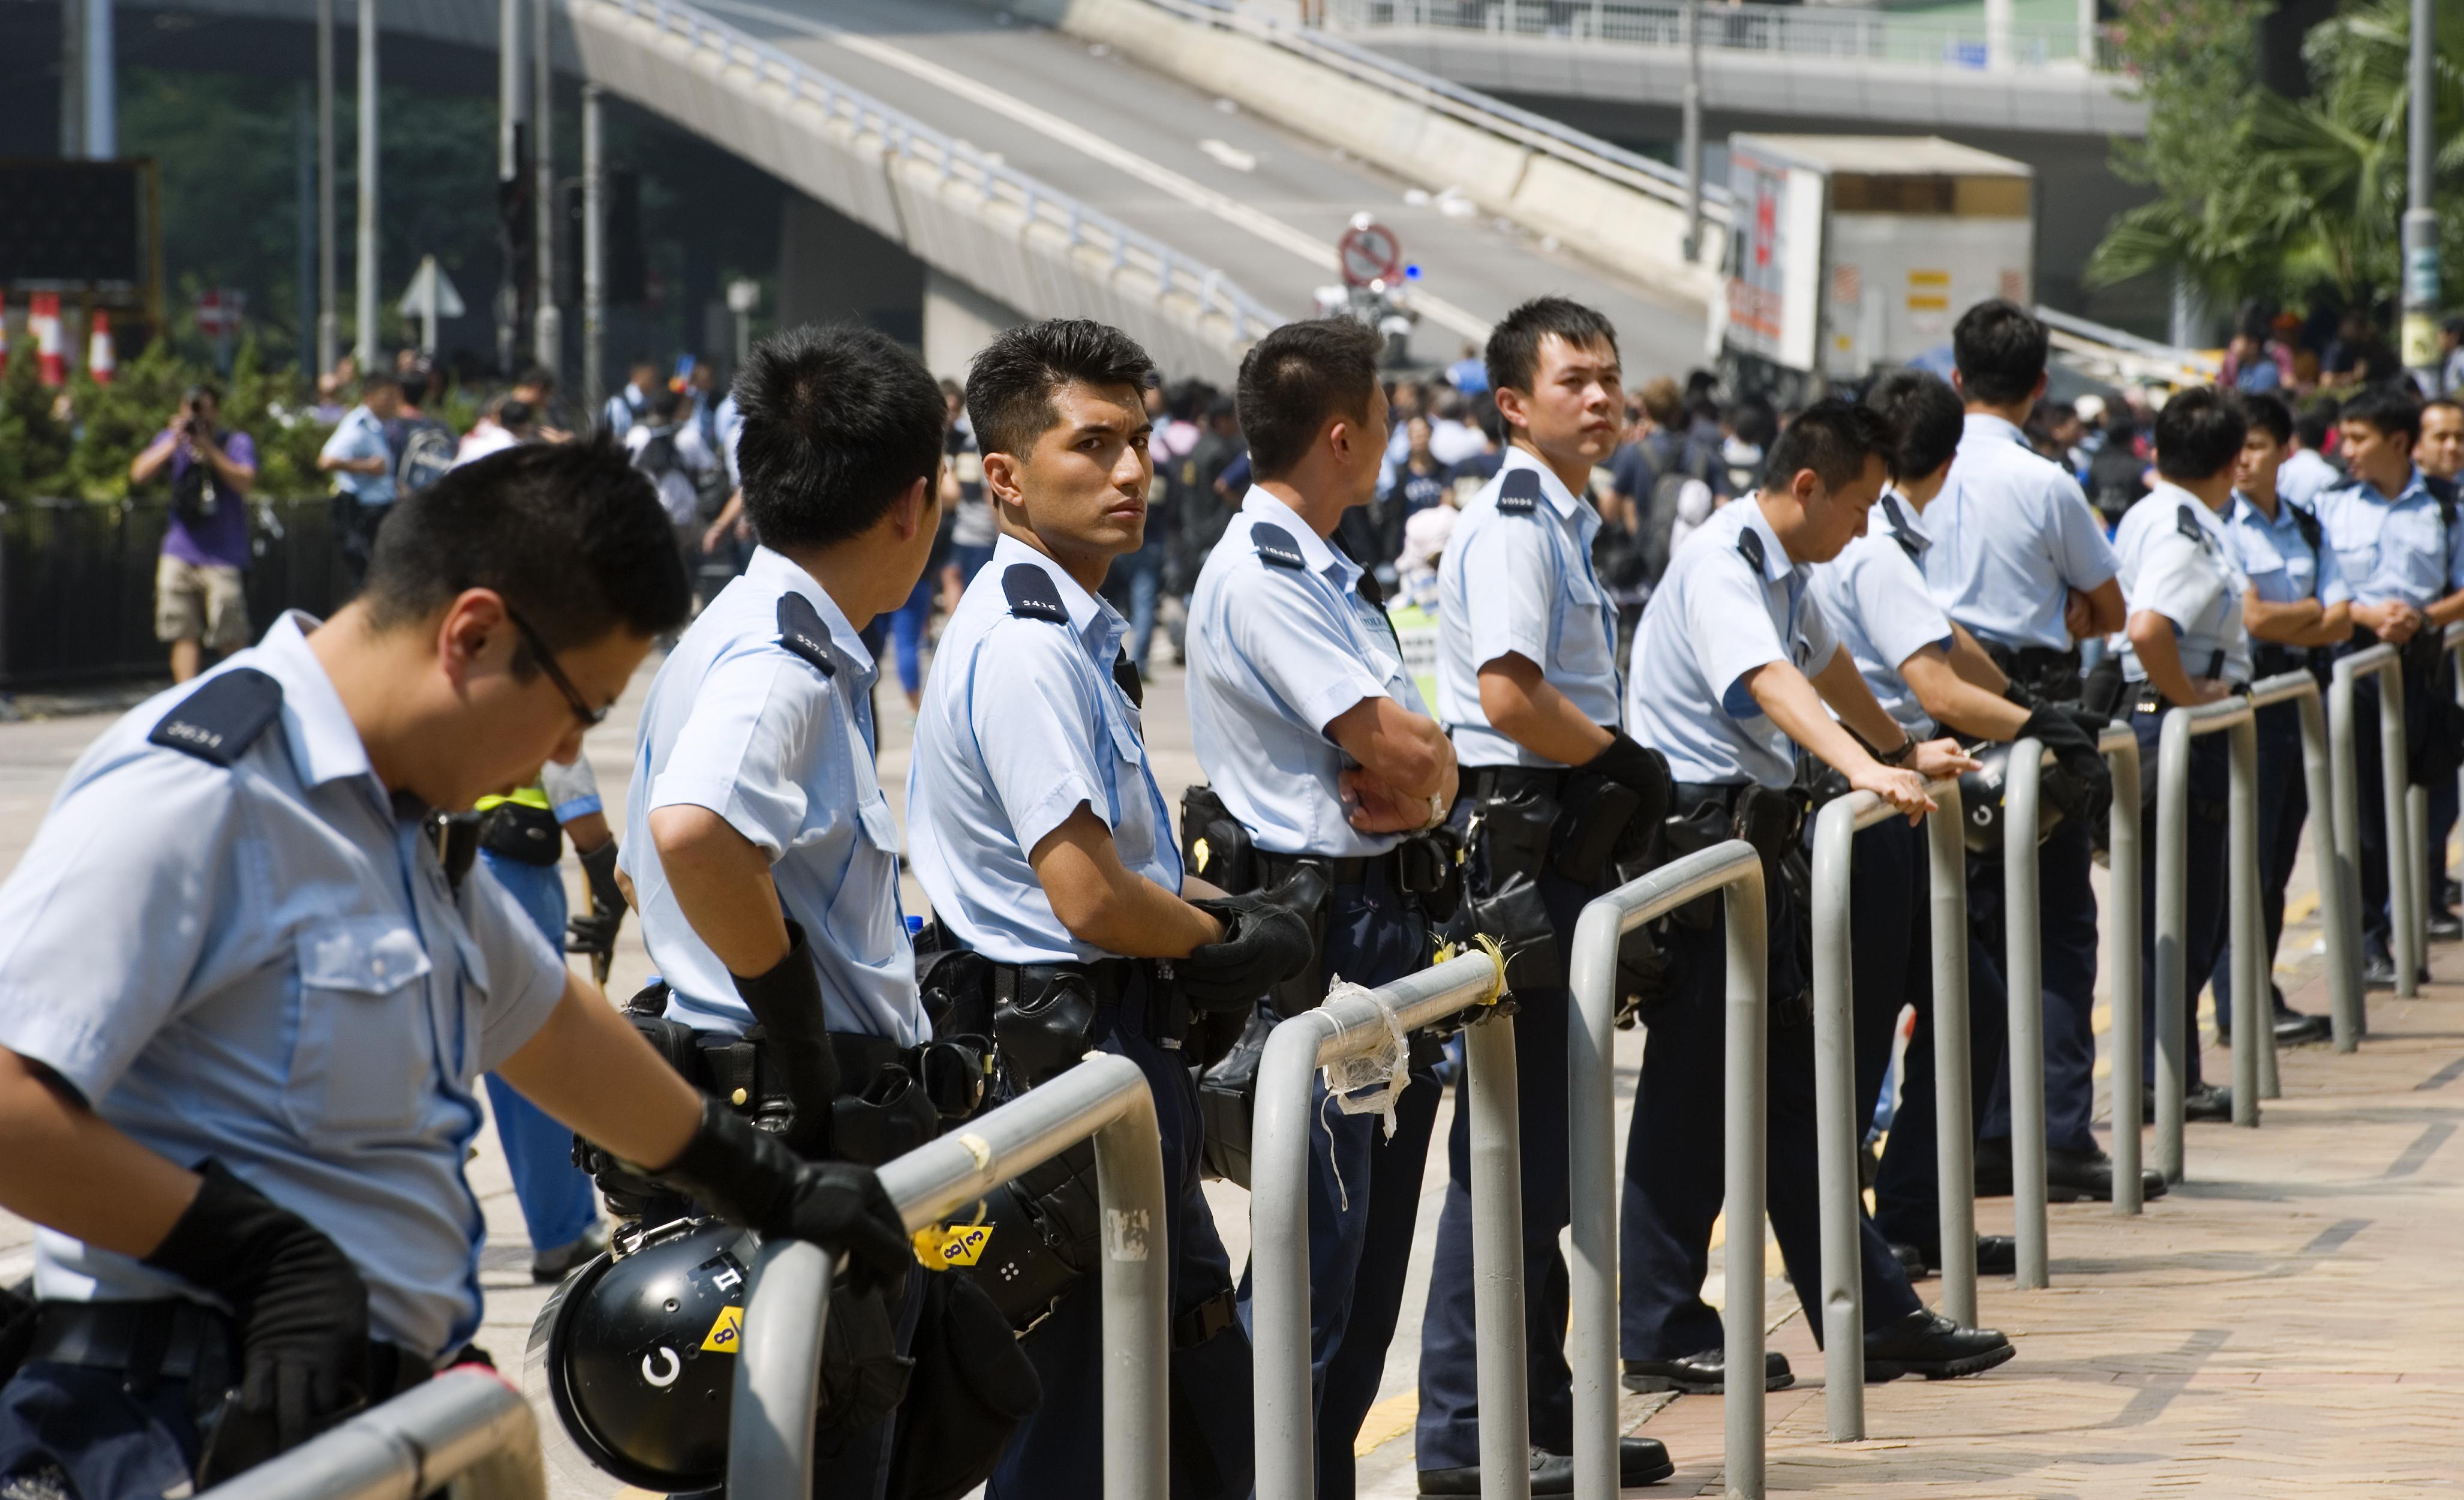 Third week of Pro-democracy Protests In Hong Kong